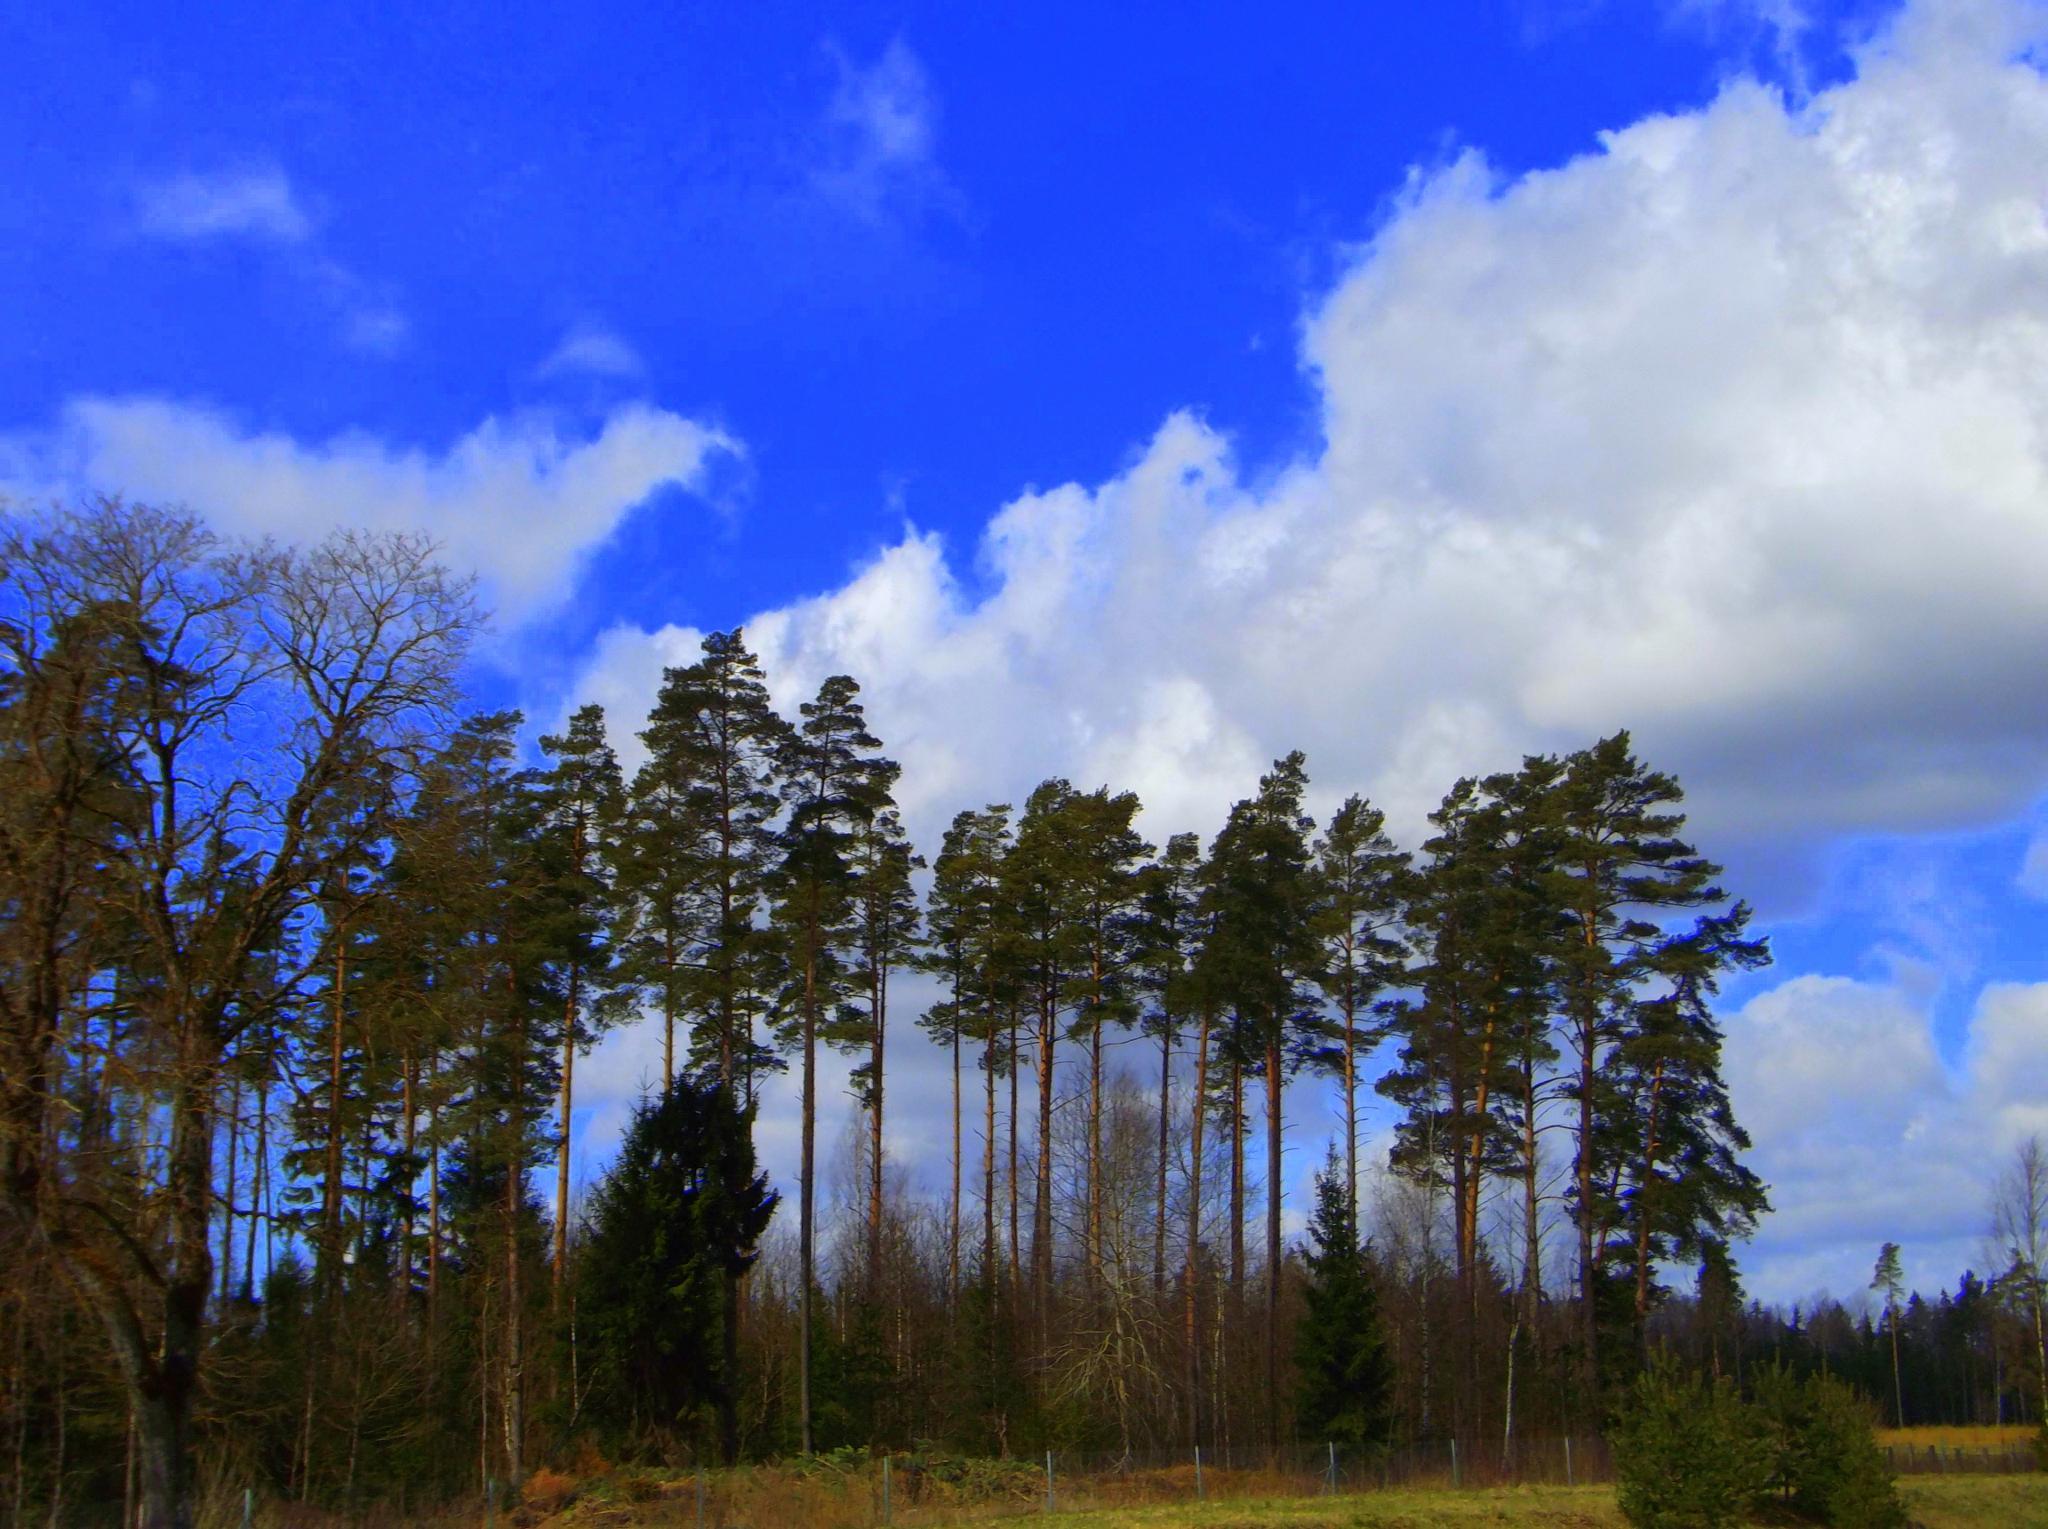 Trees & sky by uzkuraitiene62